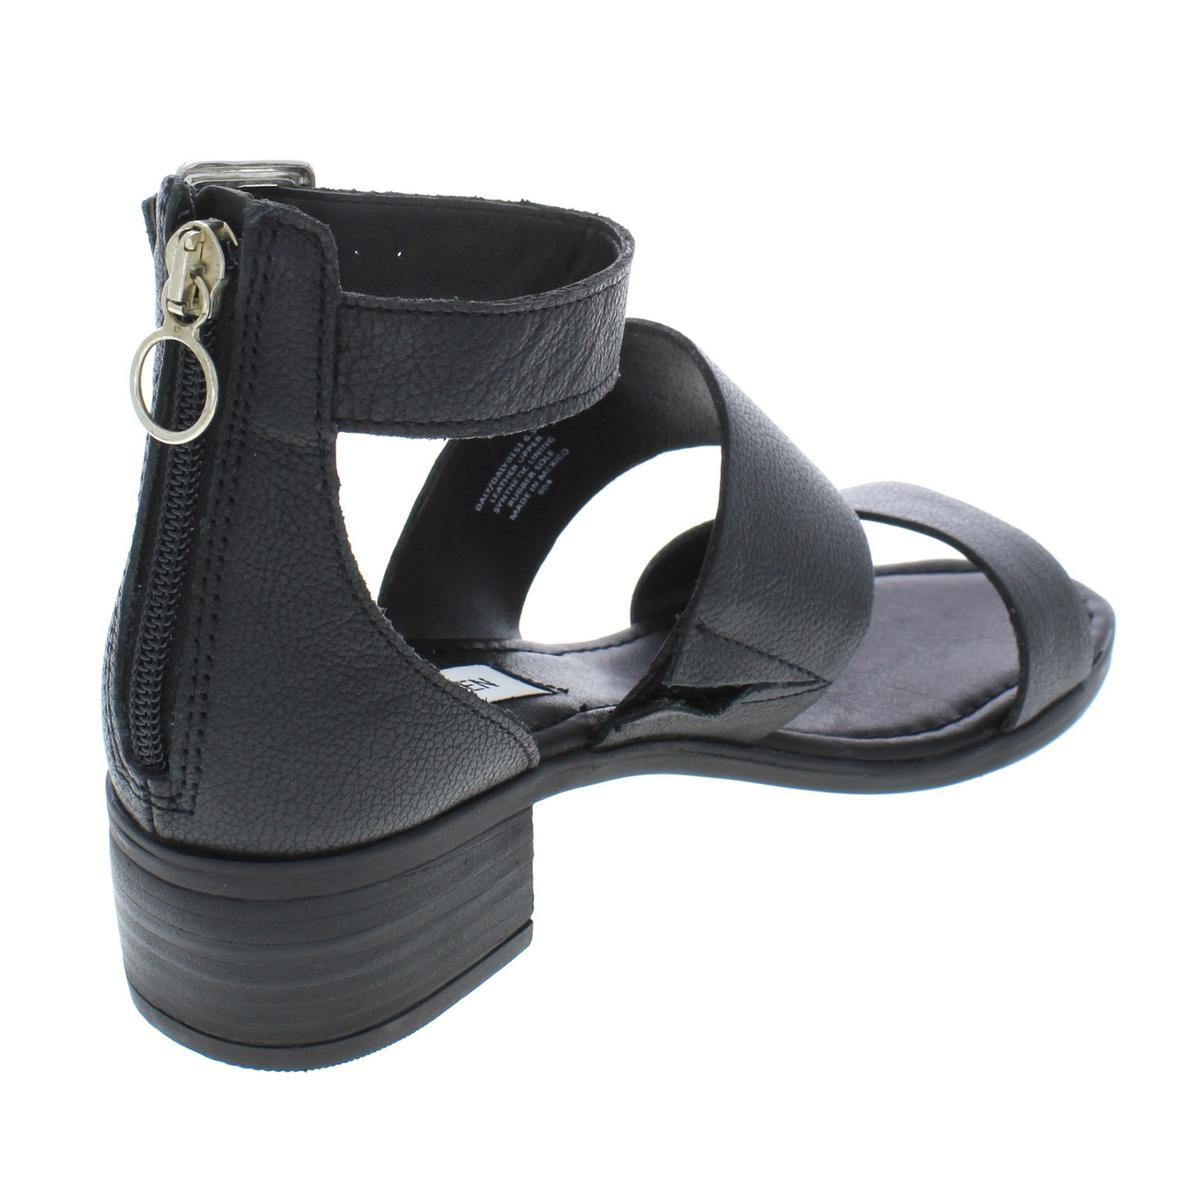 Steve-Madden-Womens-Daly-Leather-Open-Toe-Dress-Heels-Sandals-BHFO-5458 thumbnail 4